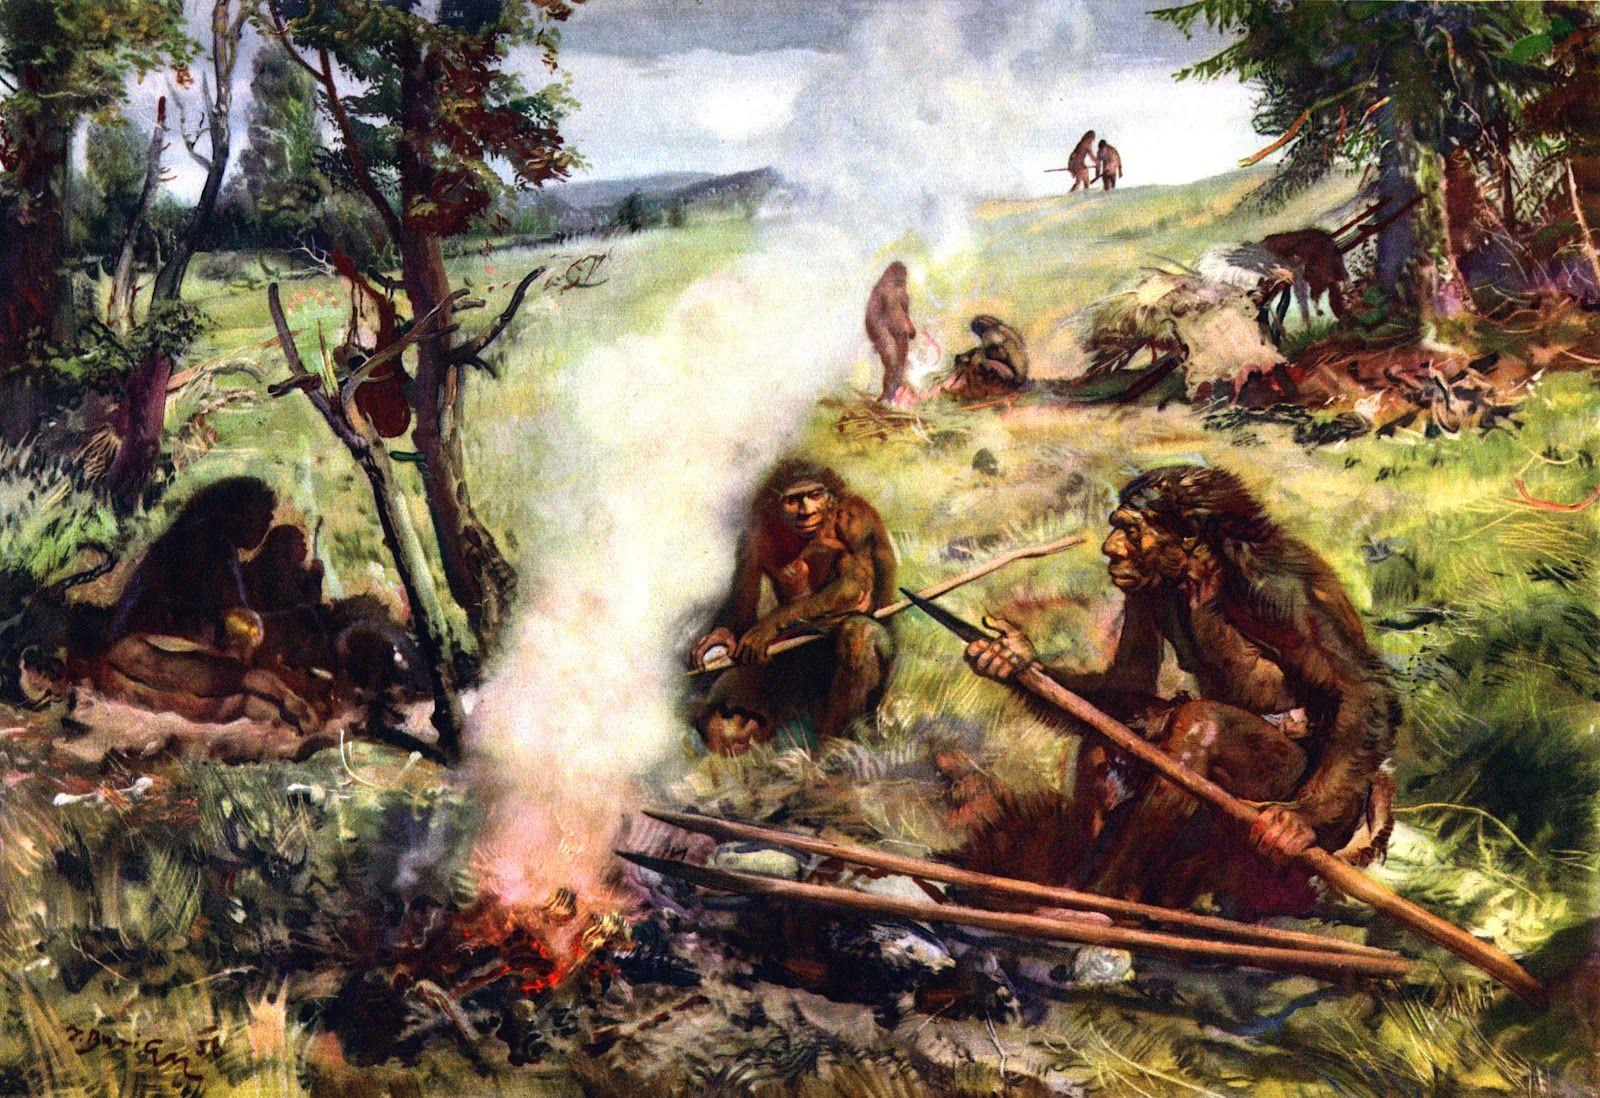 Illustration By Zdenek Burian Prehistoric Man